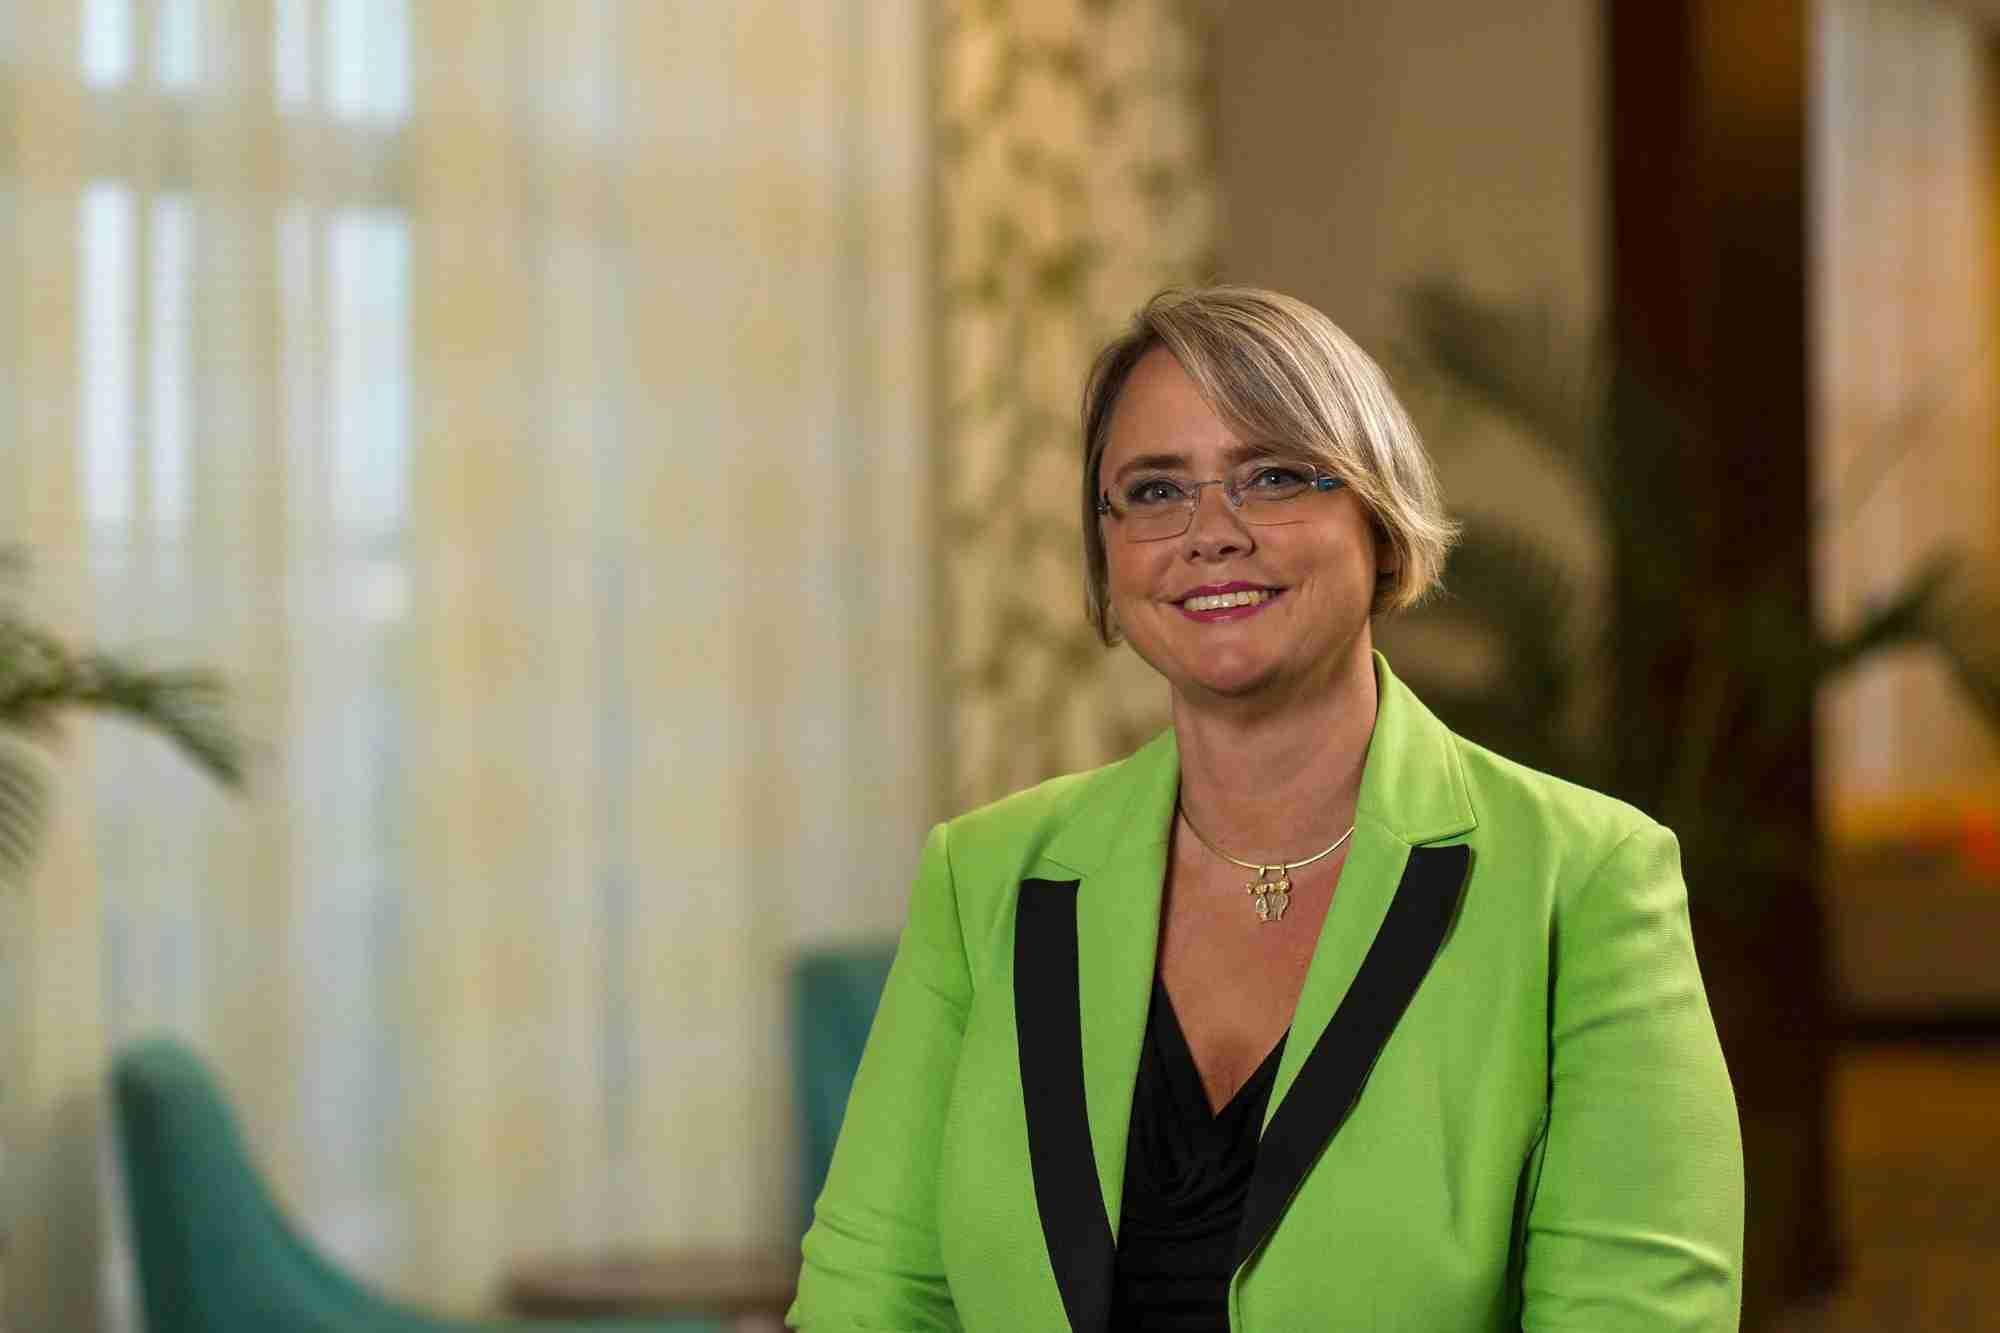 Louella Brezovar, hotel manager at The Ritz-Carlton, Aruba.